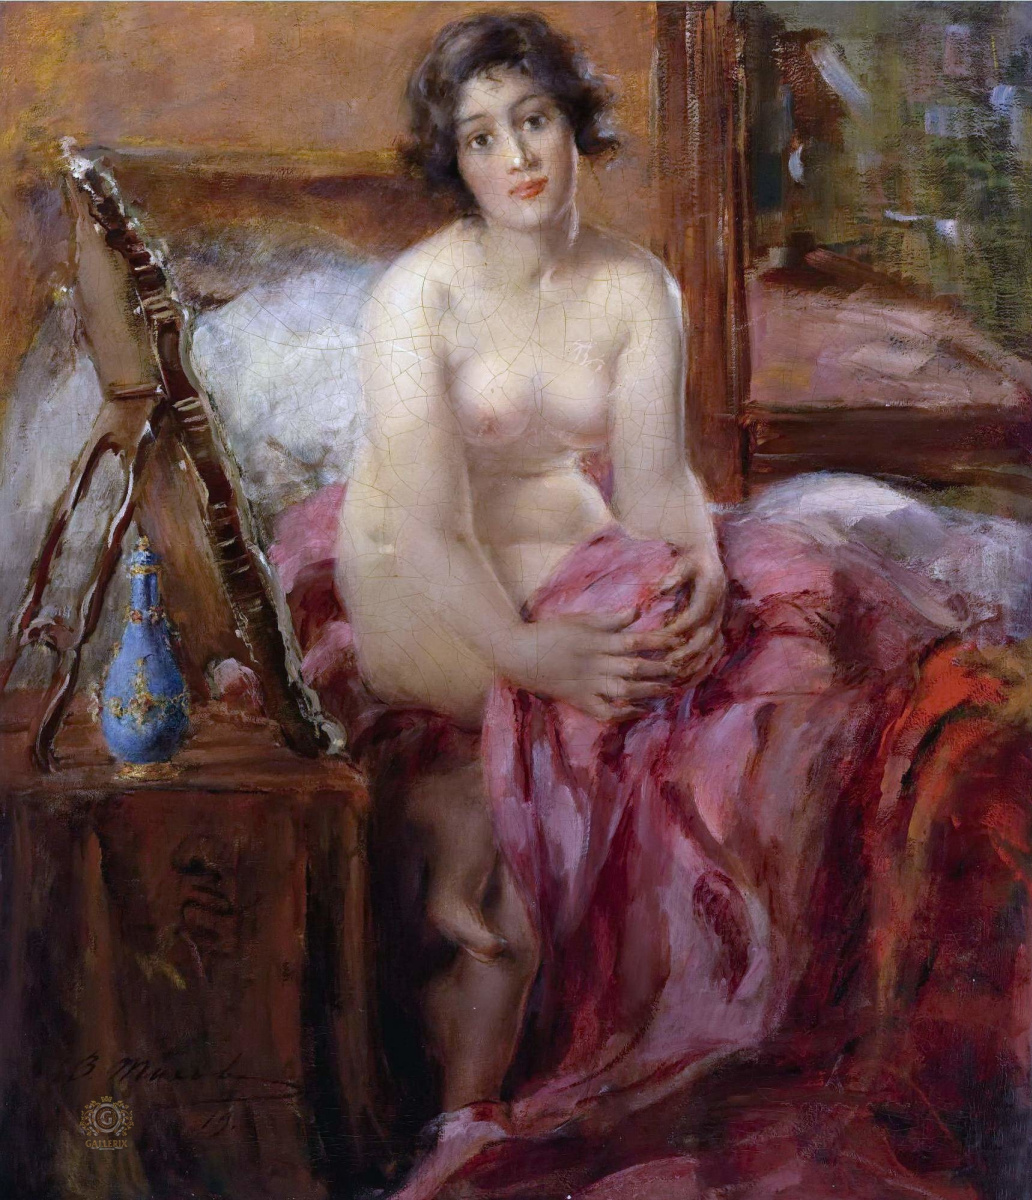 Виталий Гаврилович Тихов. Портрет обнажённой. 1919